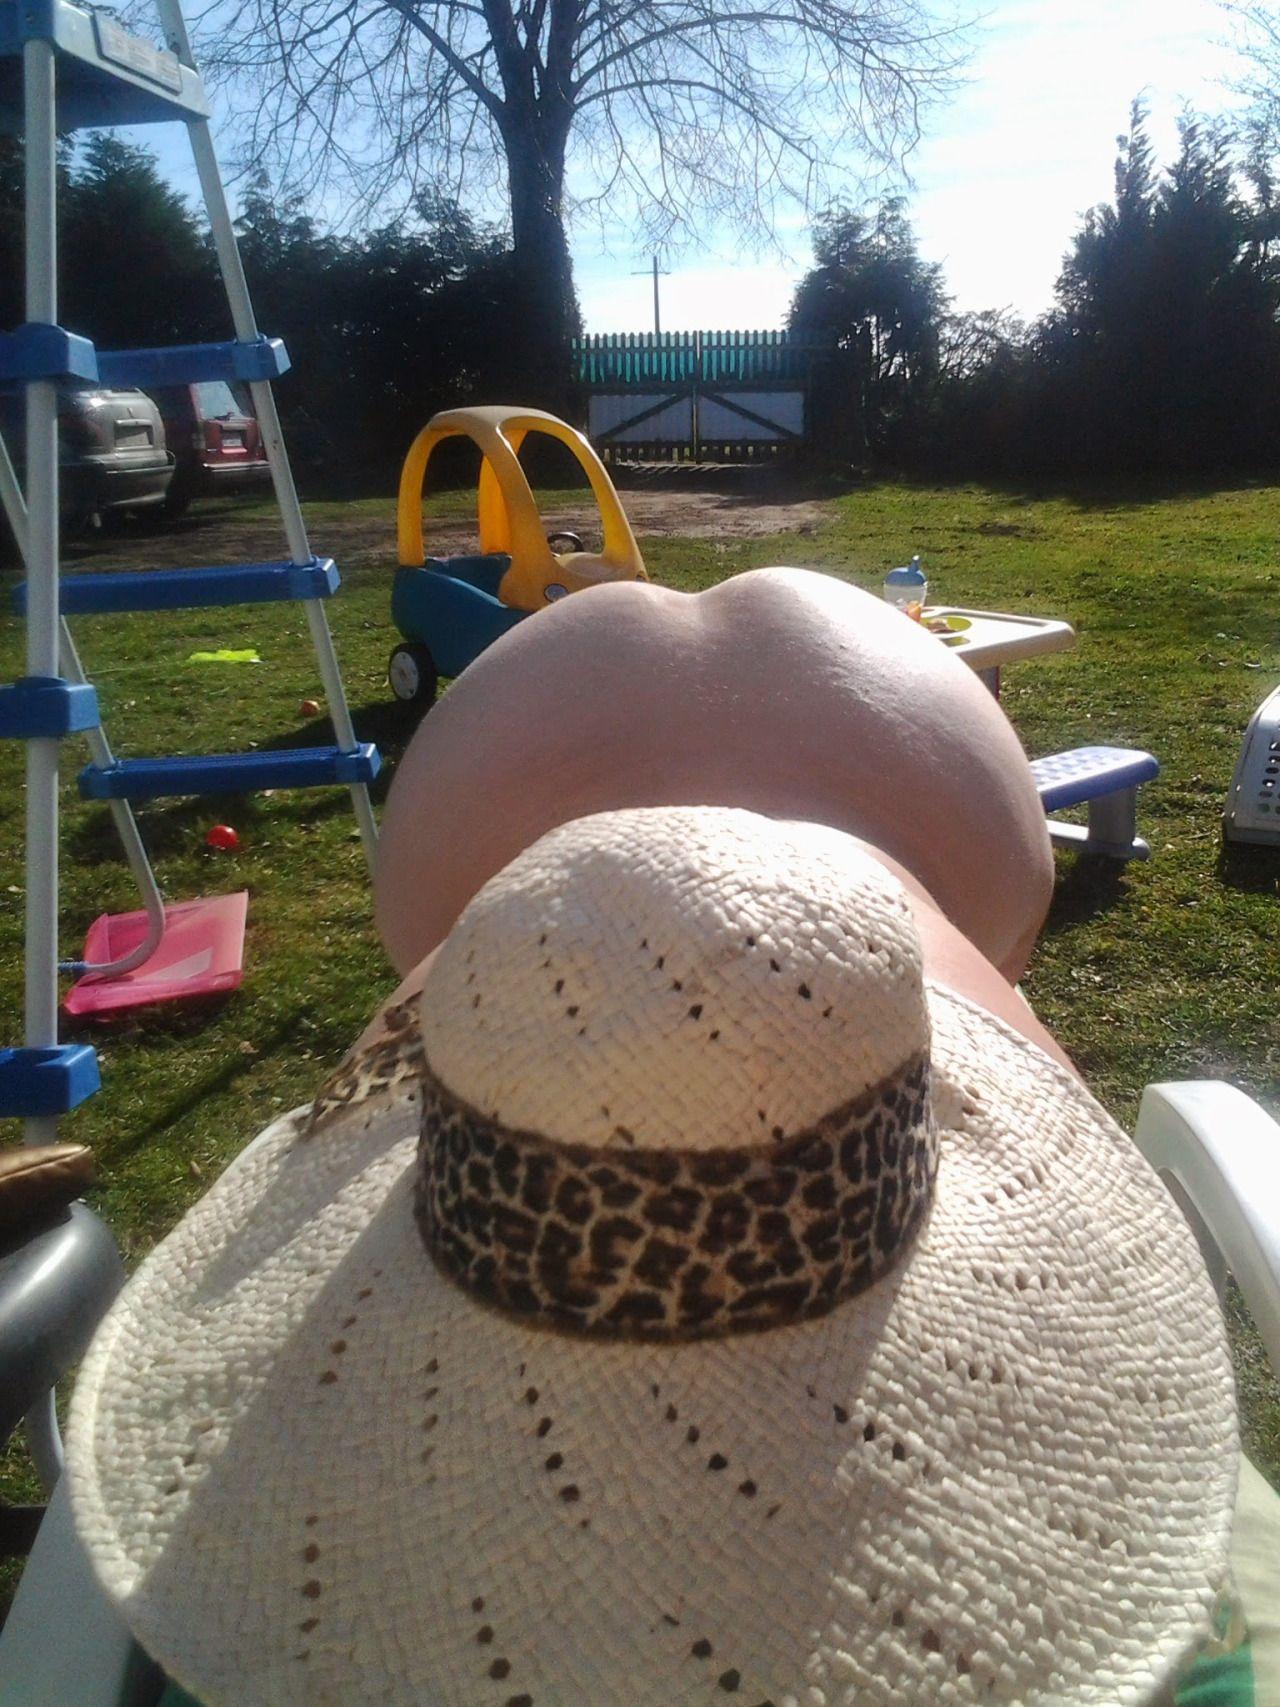 amateur curvy bbw french fancy 69 !!!!! | oh yeah | pinterest